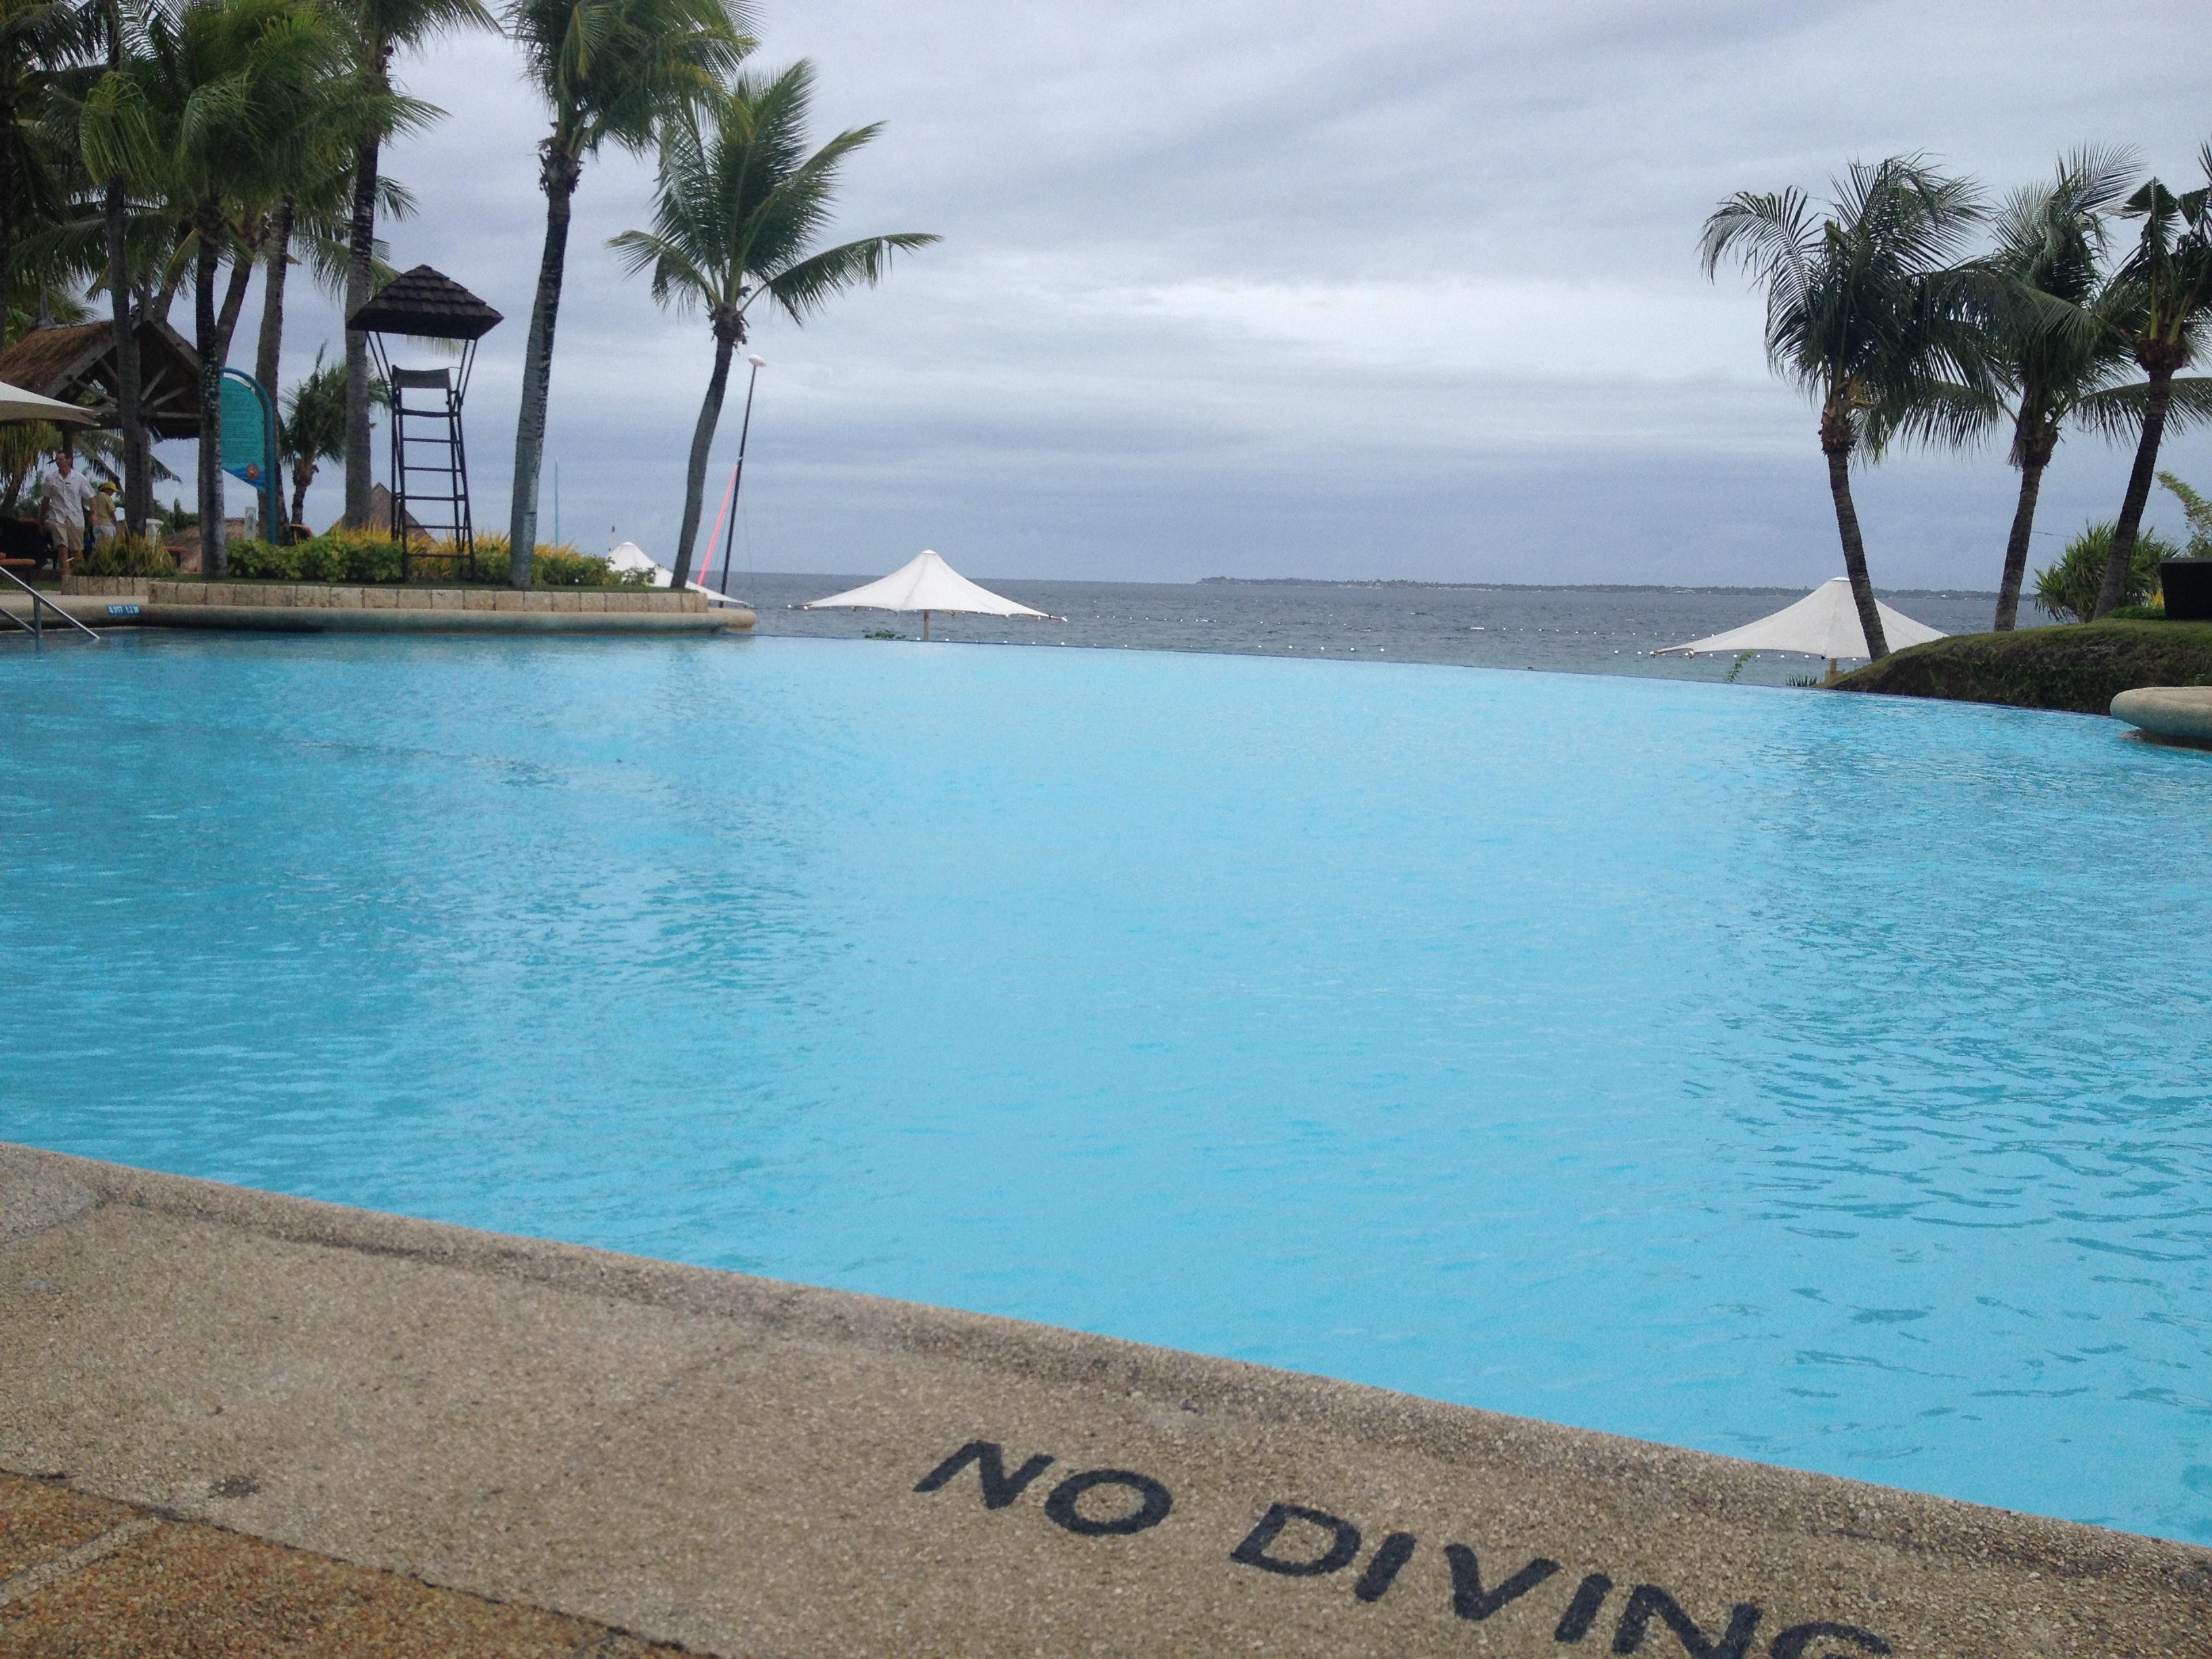 Cebu Shangri La Hotel